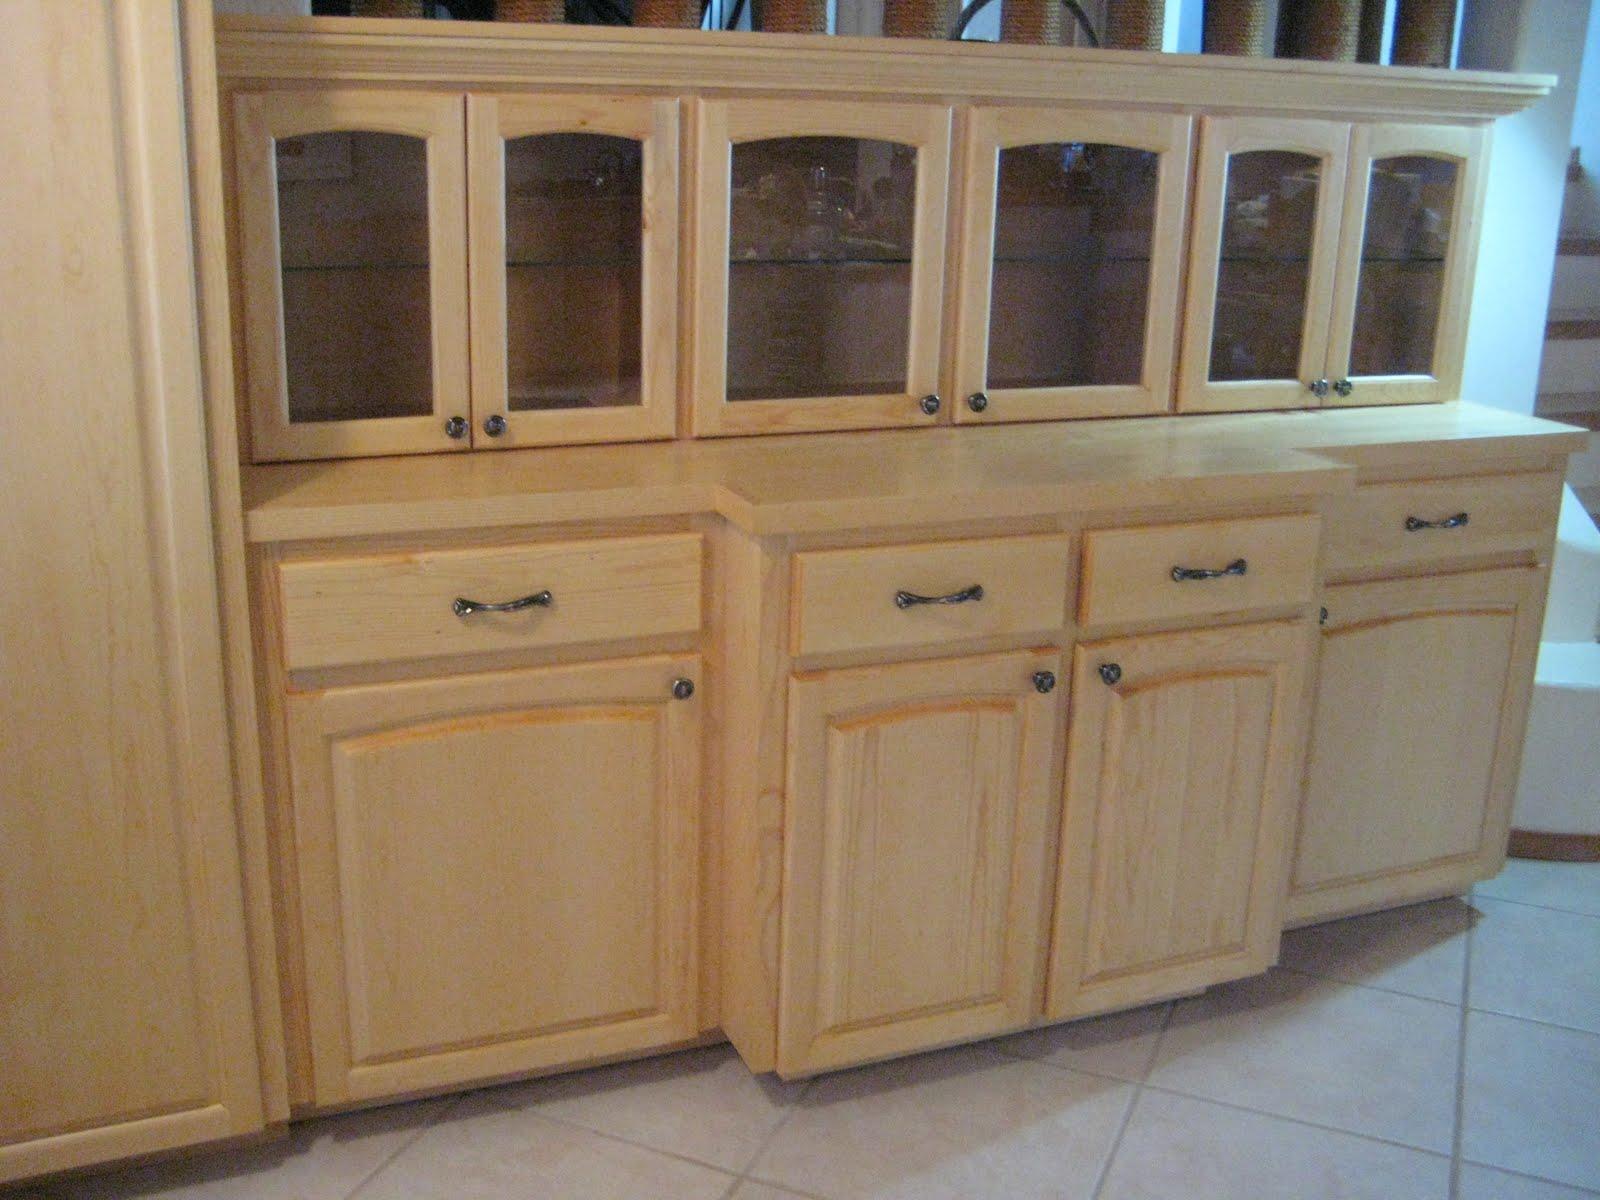 Depressioneradesigns Custom Clear Pine Cabinets